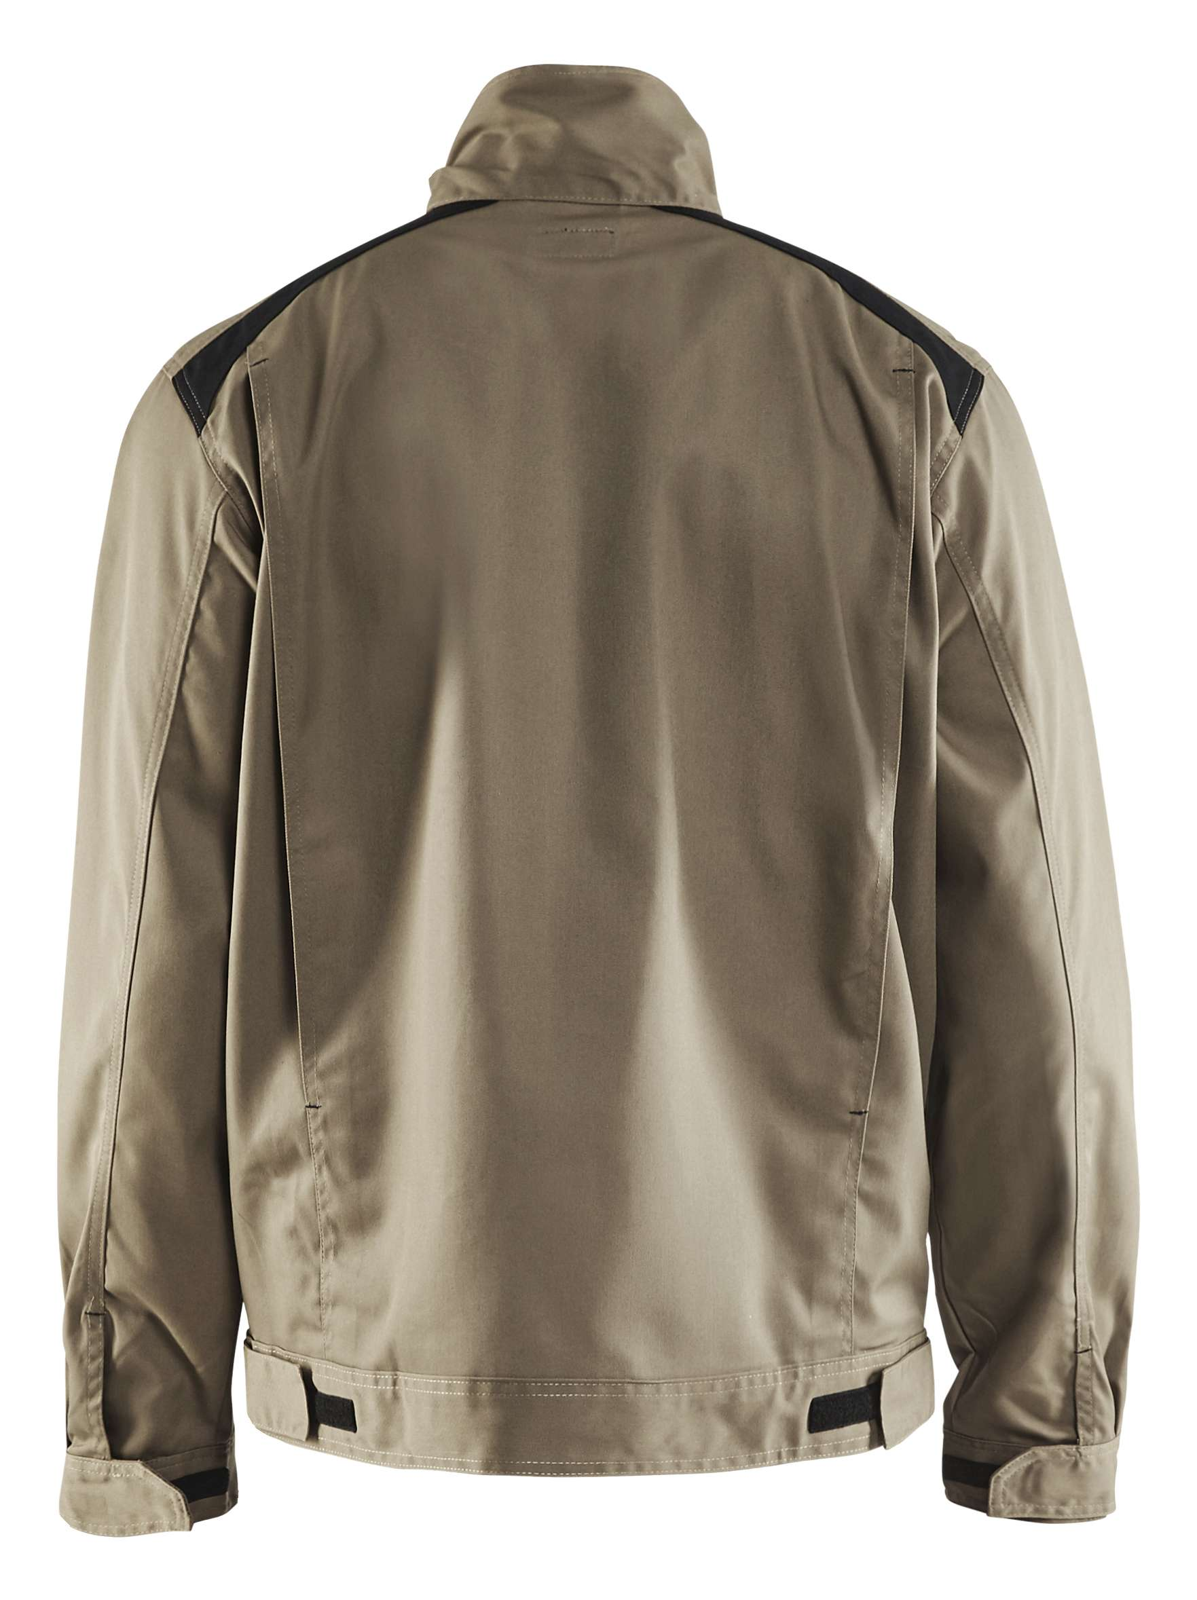 Blaklader Combi-jacks 40541800 khaki-zwart(2499)